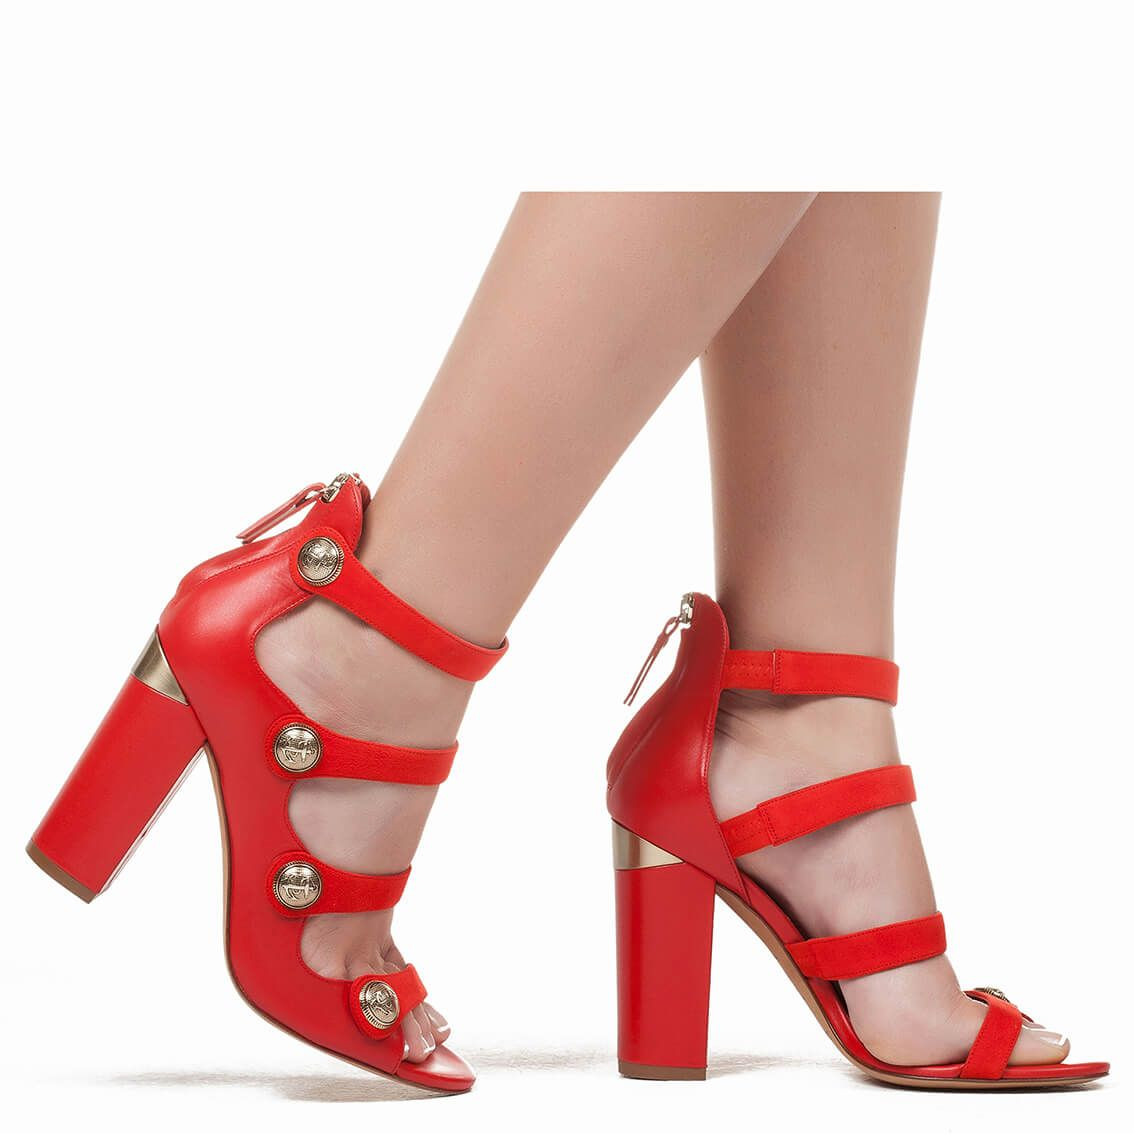 Sandalias Zapatos López Rojas Pura Botón Con Tienda De Tacón IYf7yvb6g